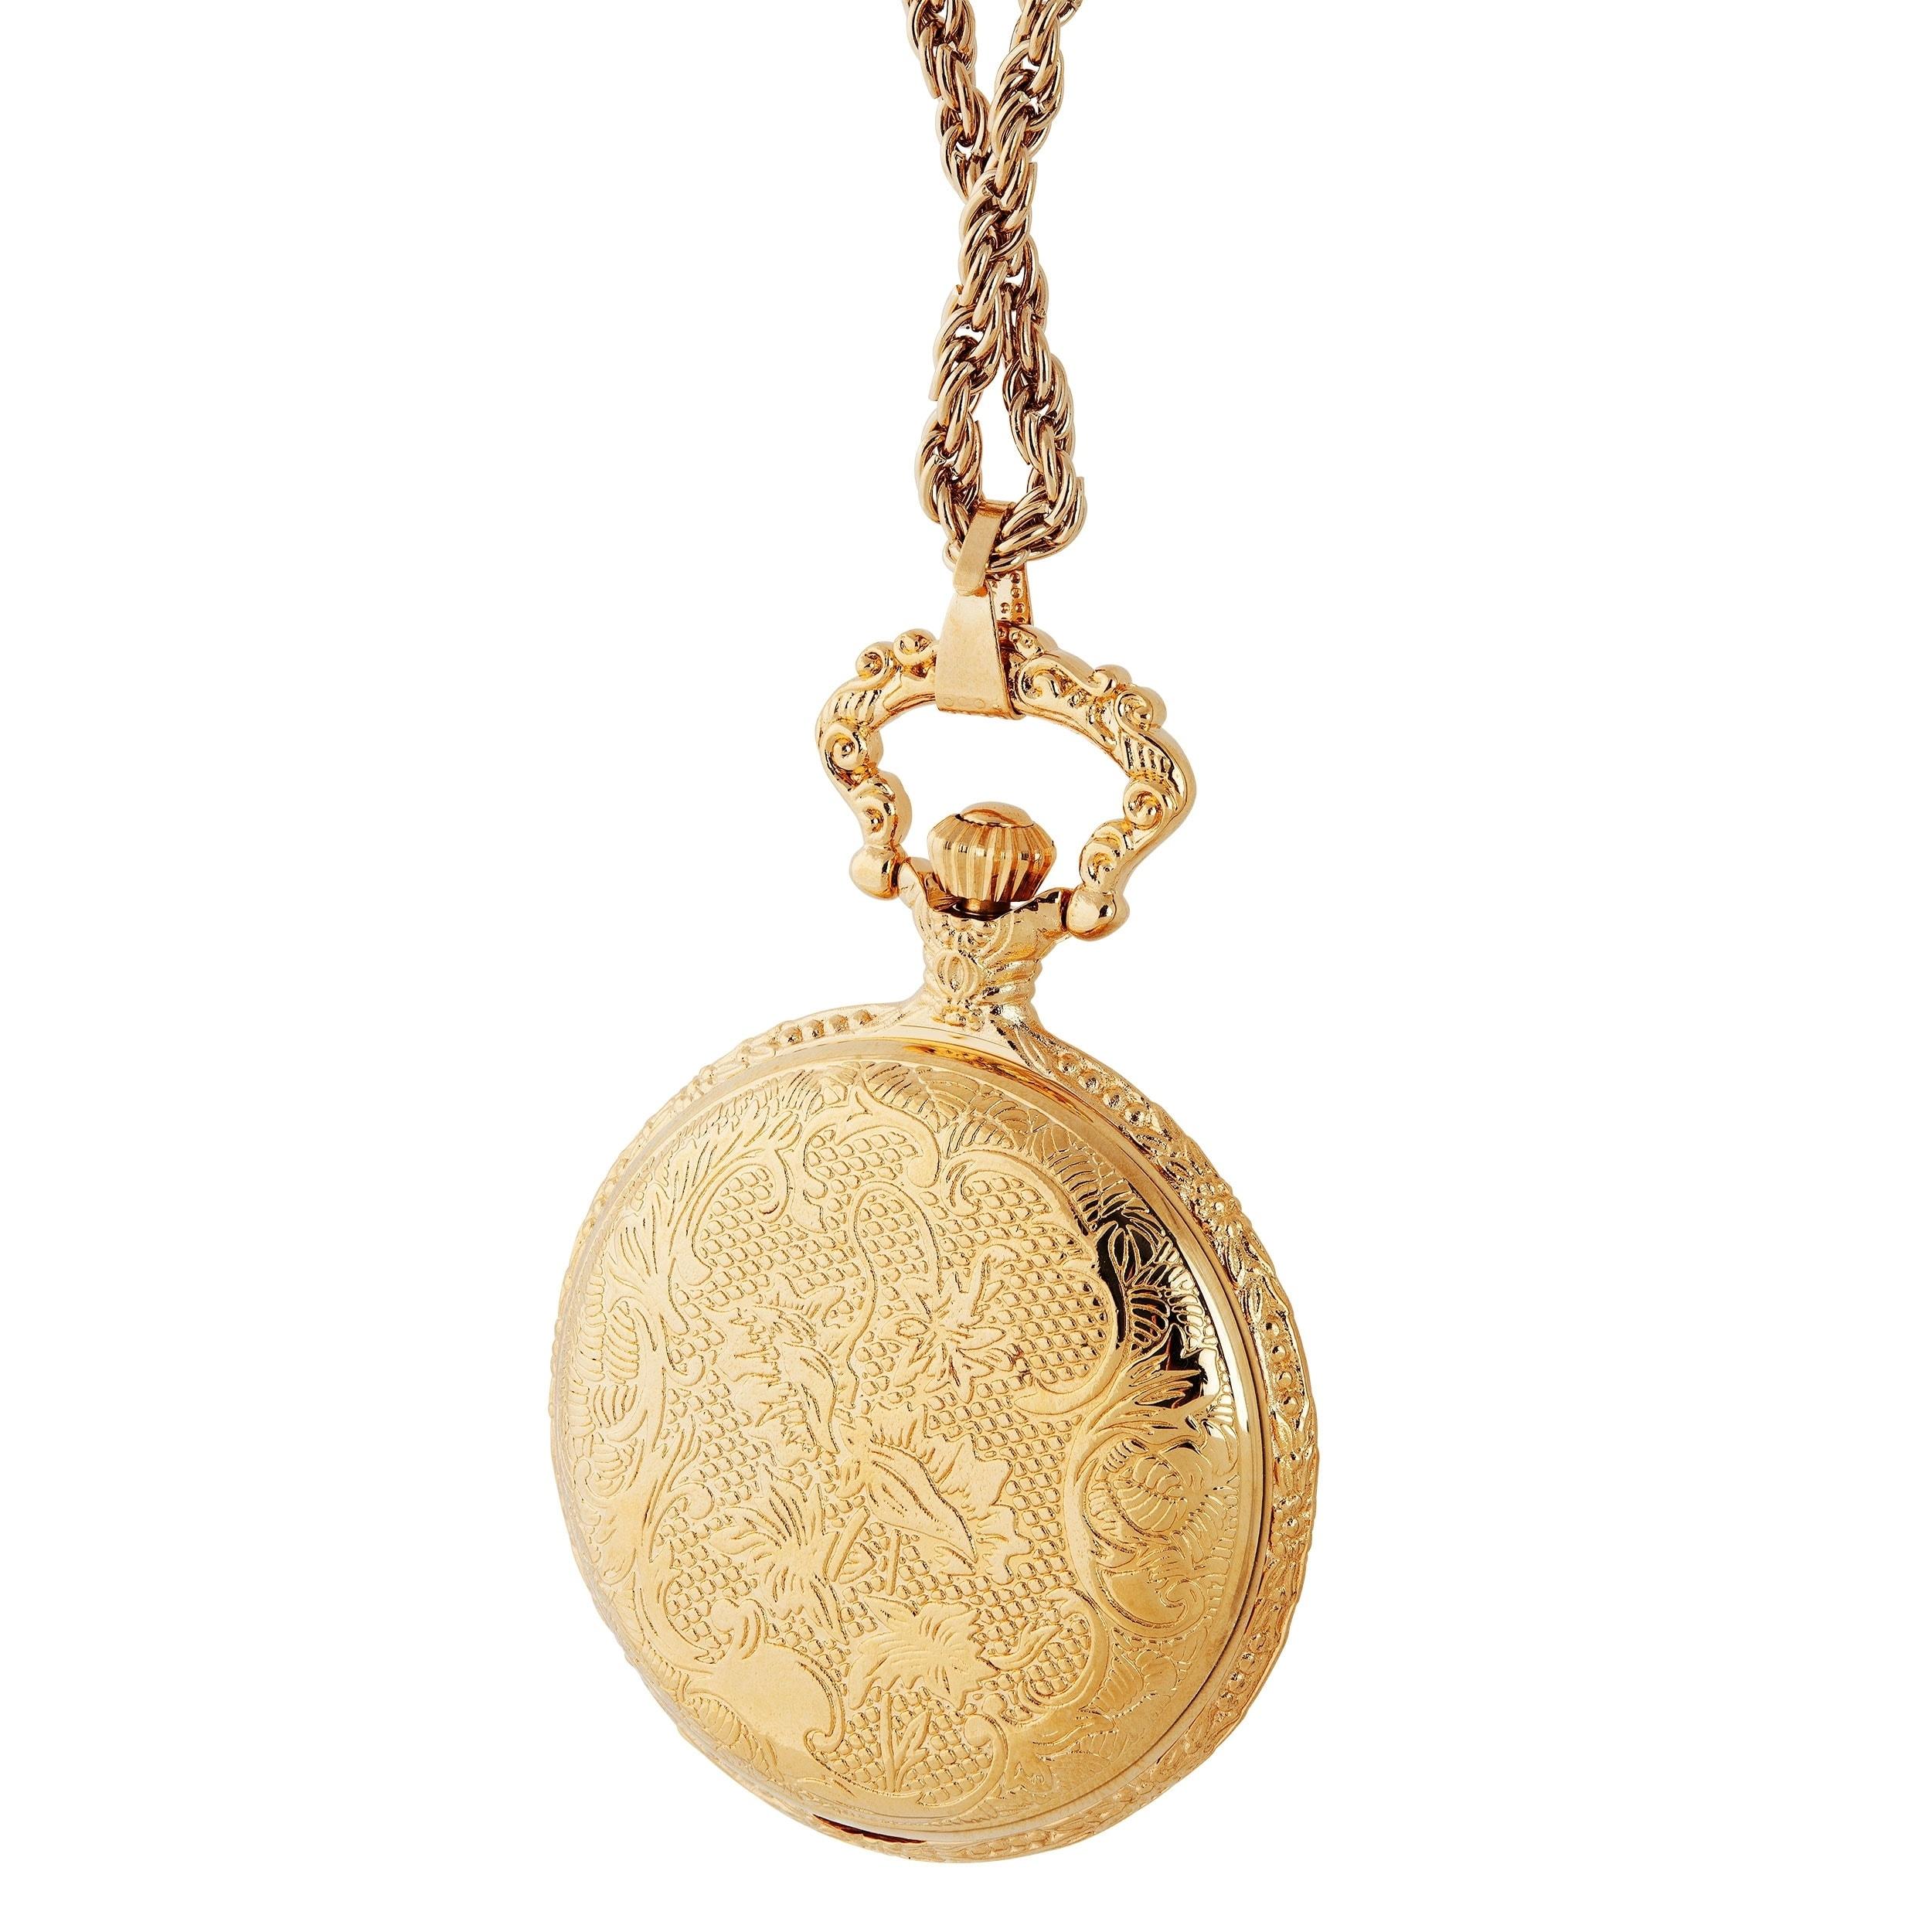 Ladies black hills gold pendant watch free shipping on orders over ladies black hills gold pendant watch free shipping on orders over 45 overstock 23966352 aloadofball Gallery